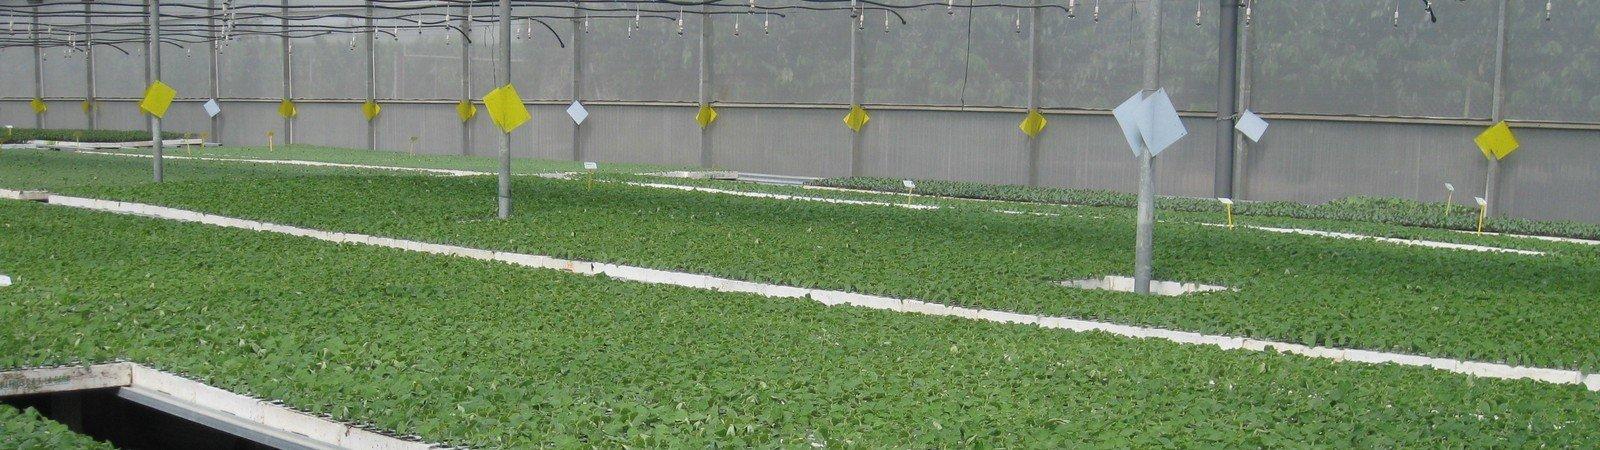 Semilleros Horto Plan  S.L., semilleros horto plan en motril, semilleros en motril, viveros motril,